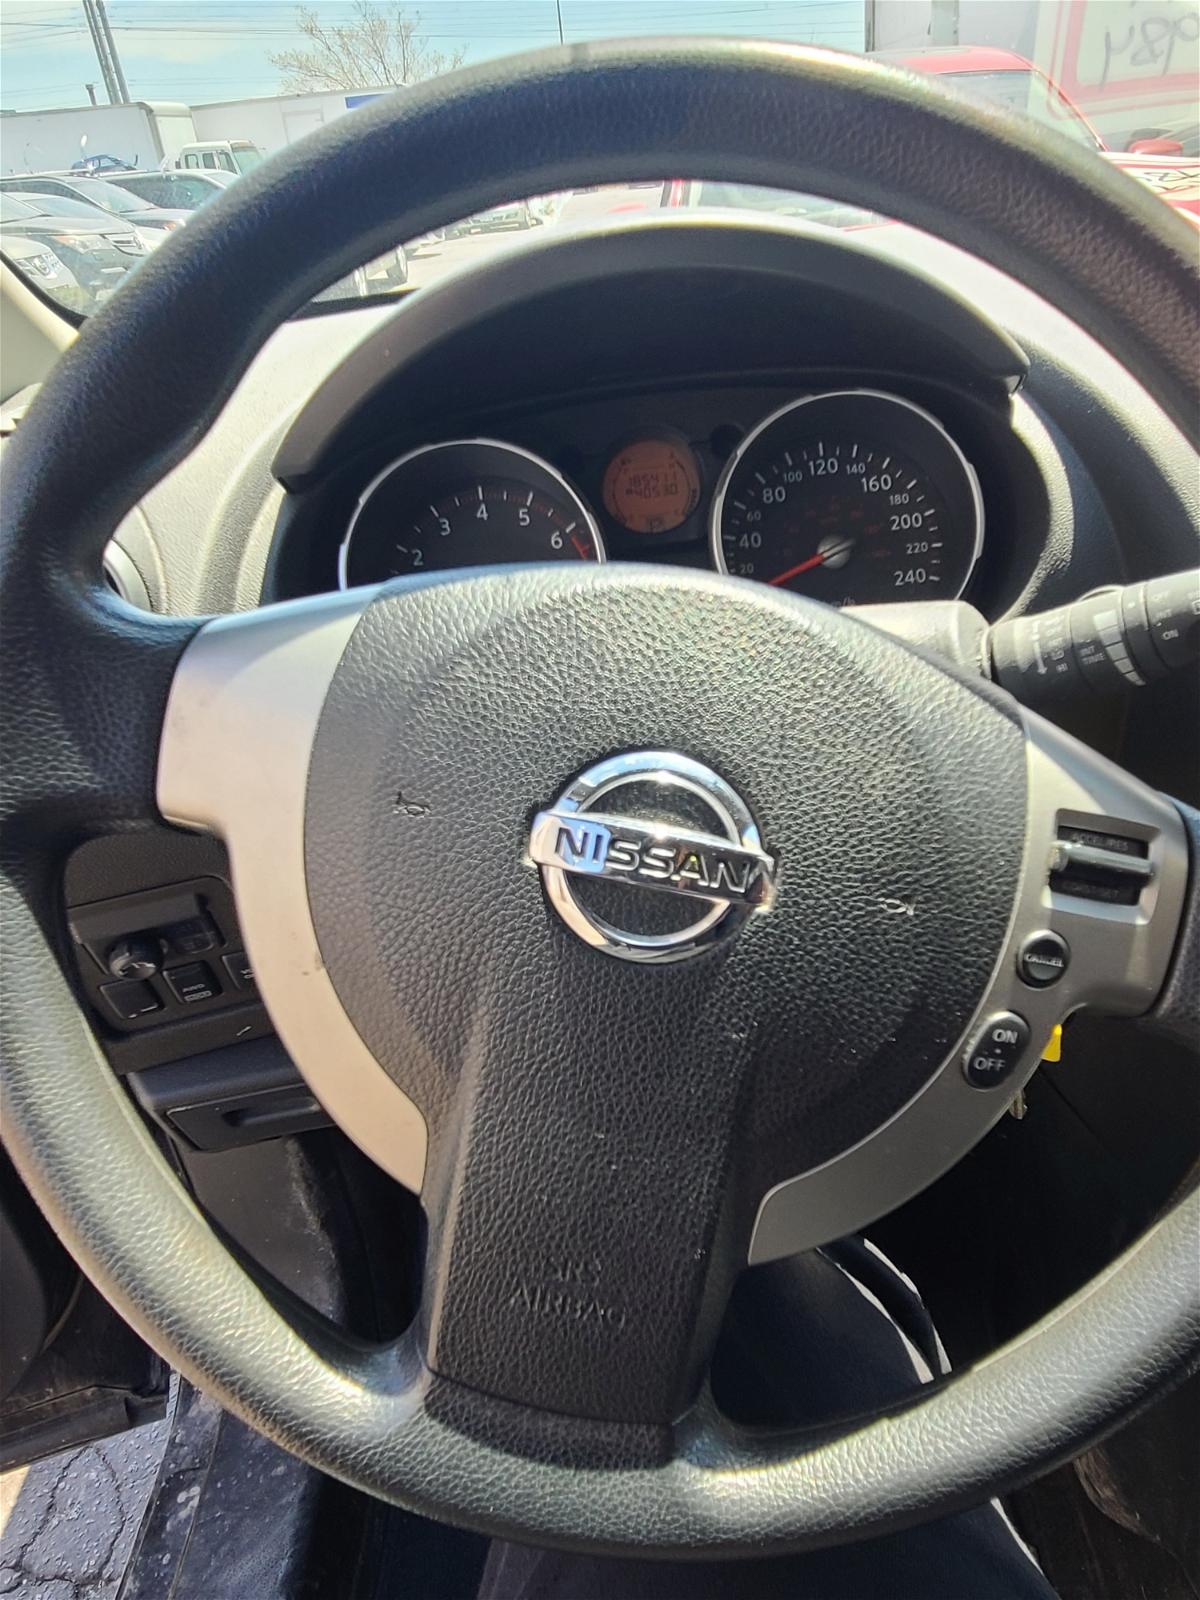 2008 - Nissan - Rogue - JN8AS58V88W409789